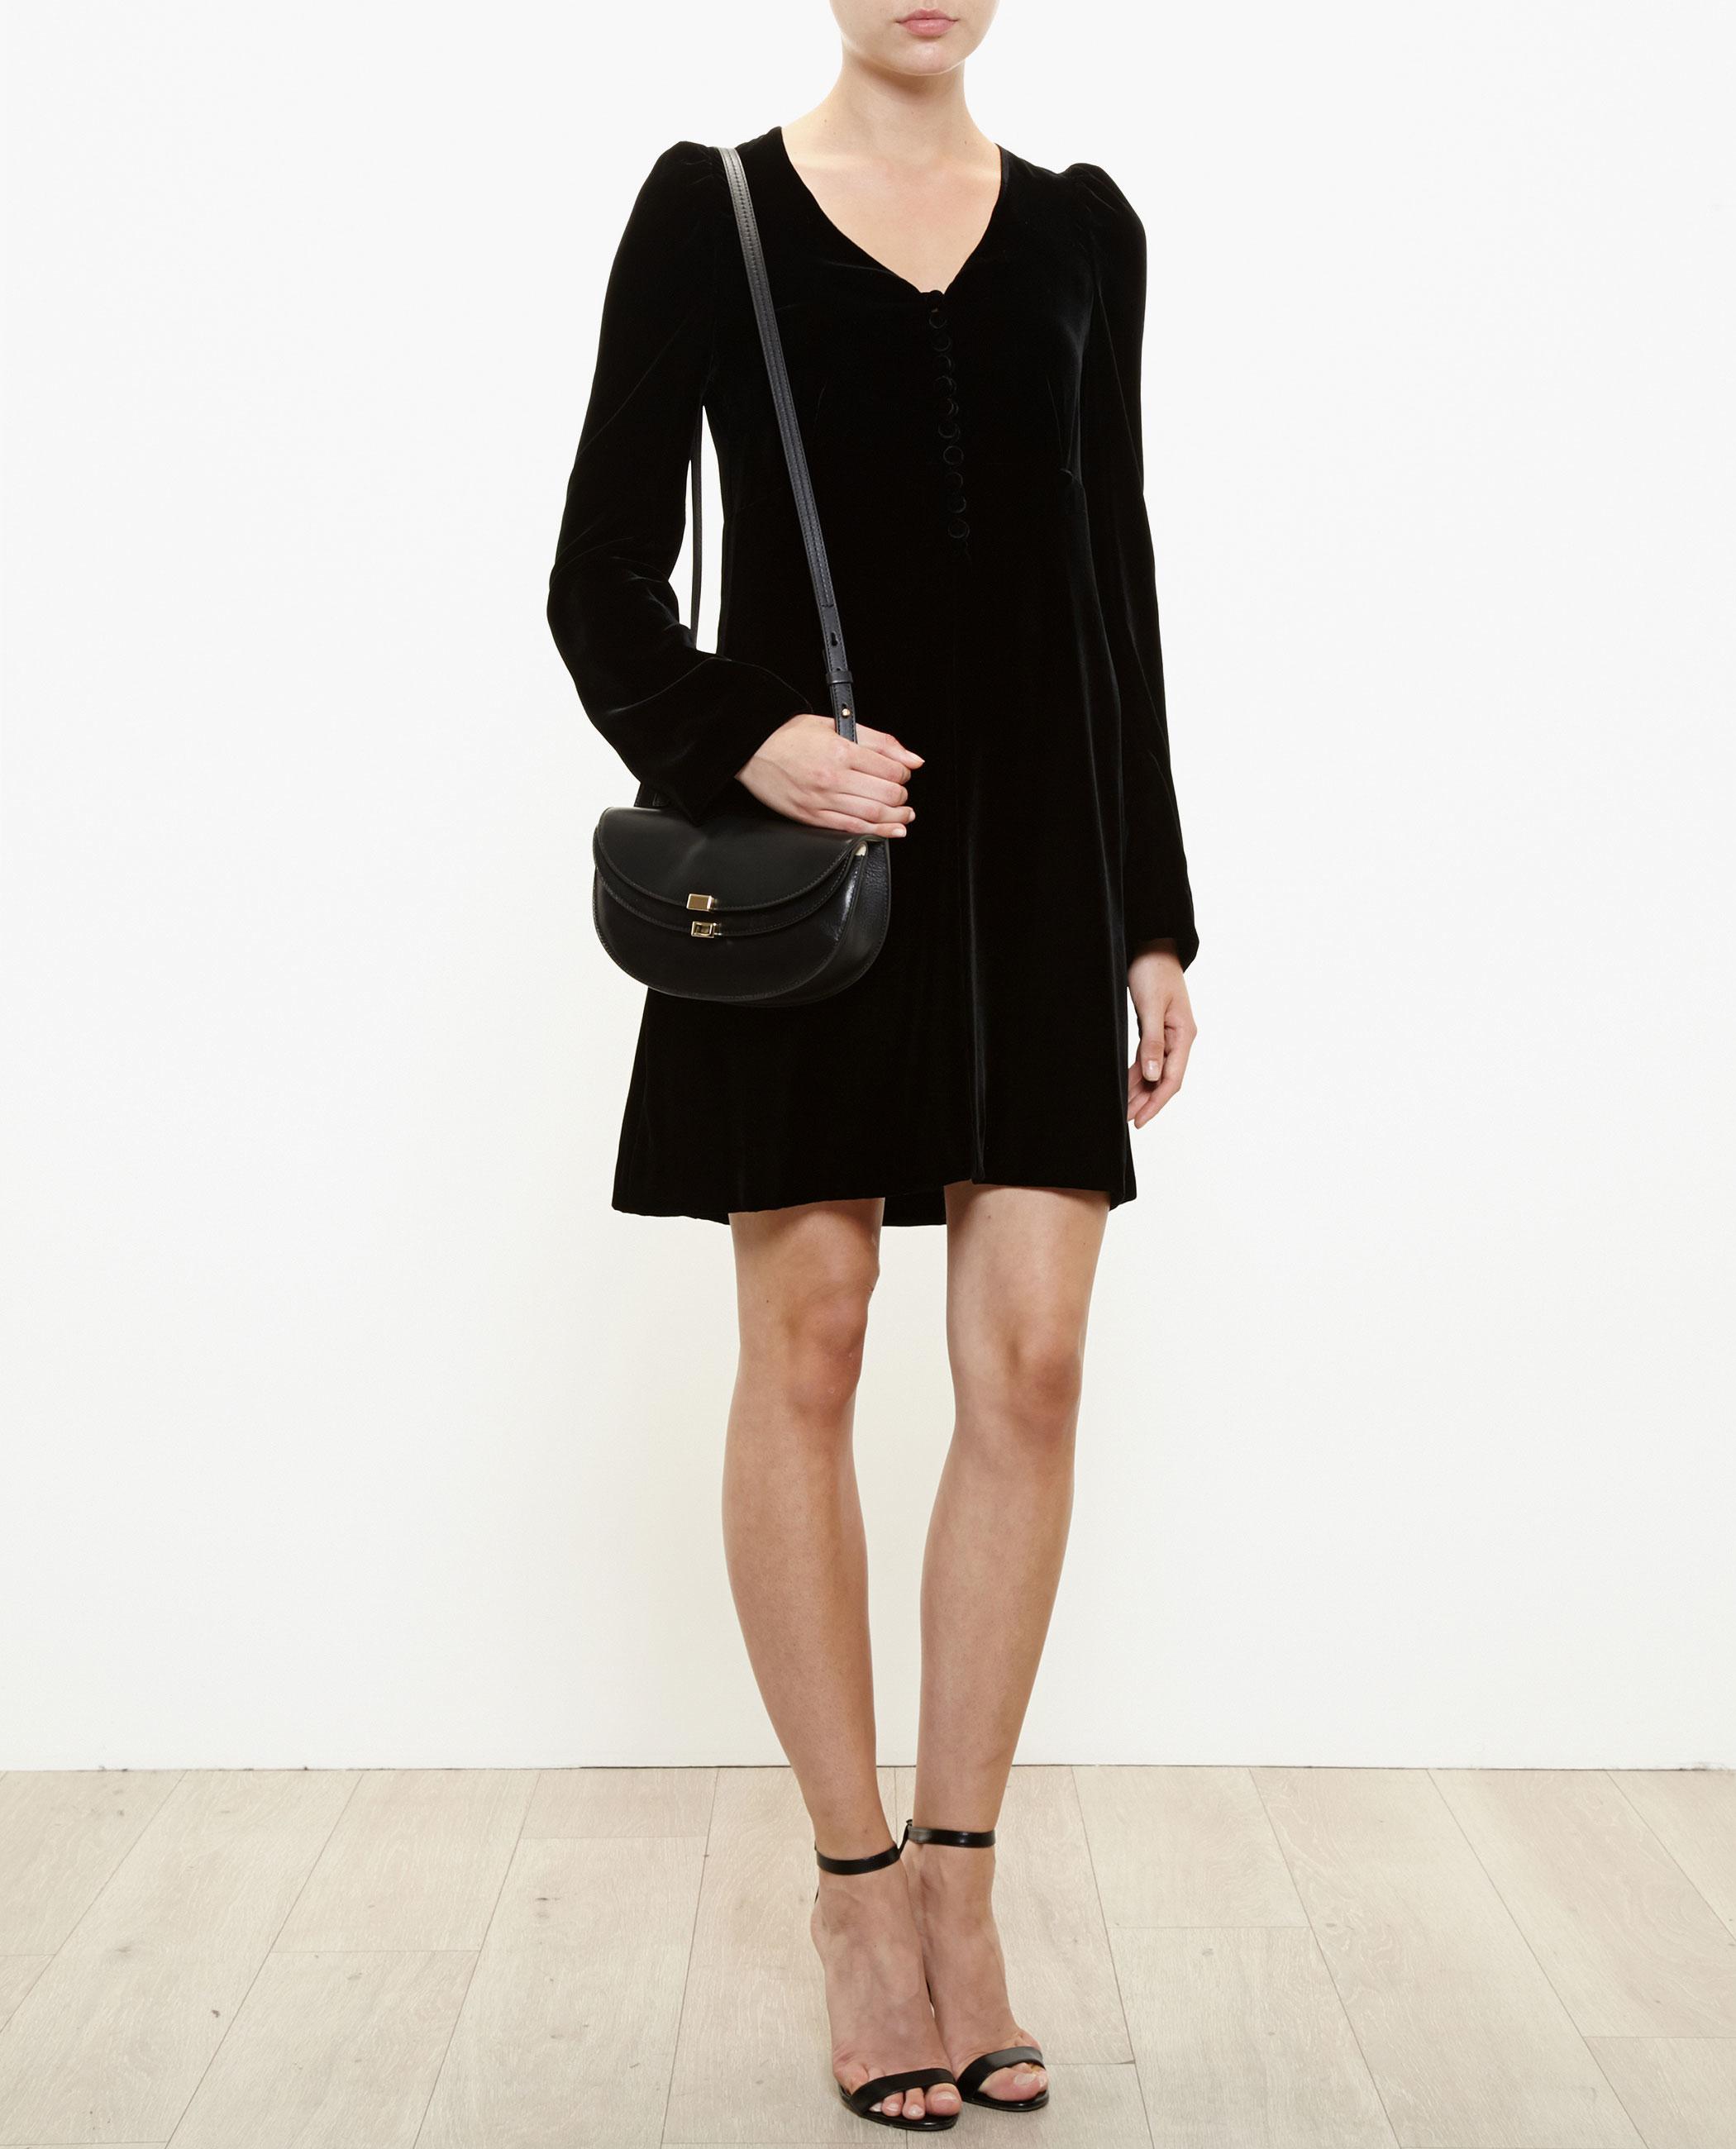 chloe leather handbags - Chlo�� Mini Georgia Bag in Black (BURGUNDY) | Lyst